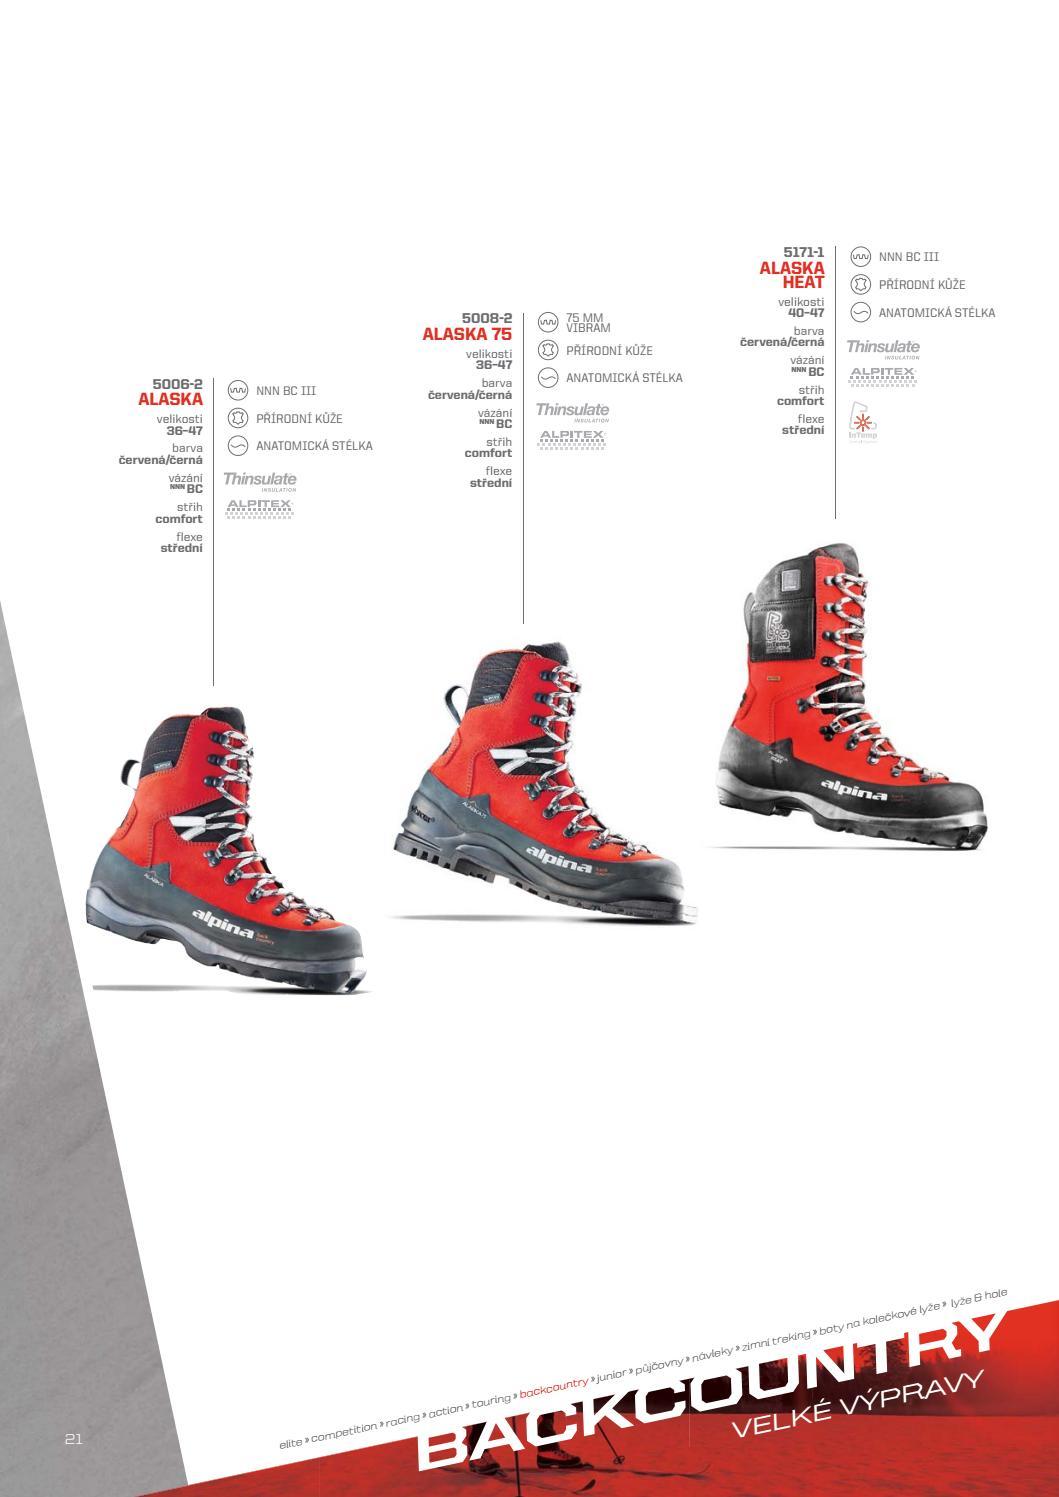 Katalog Alpina Bezecka By INA SPORT Spol S Ro Issuu - Alpina alaska